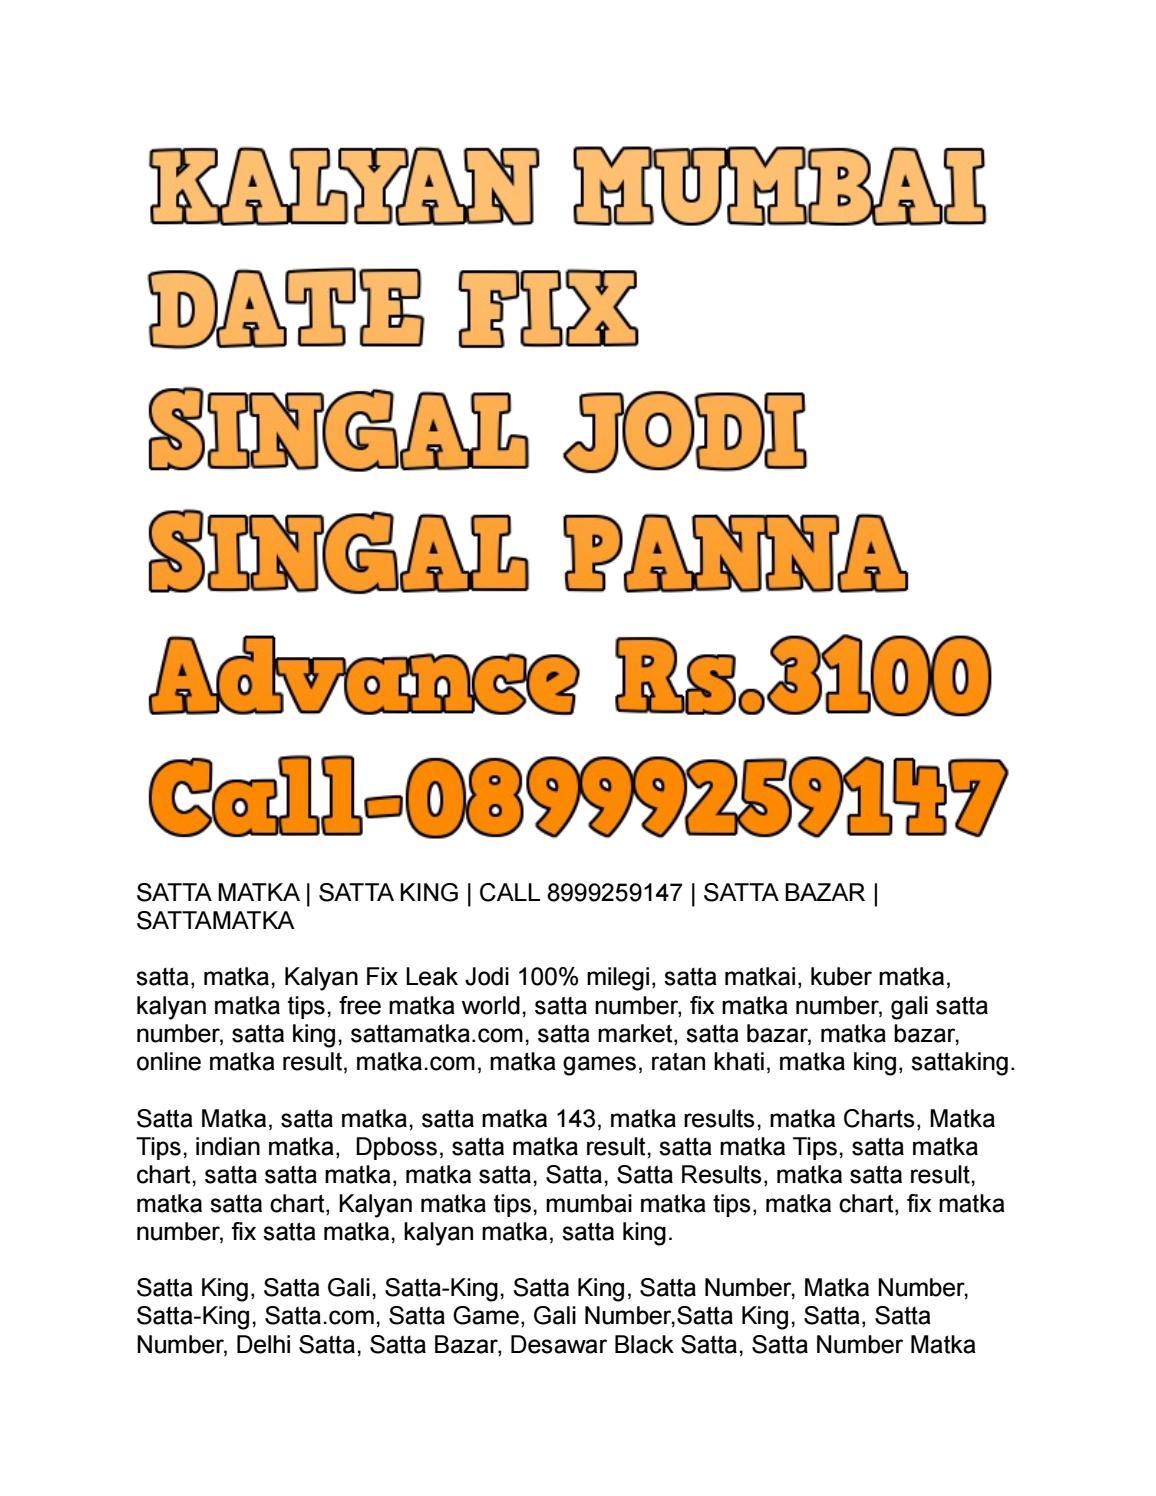 SATTA MATKA | SATTA KING | CALL 8999259147 | SATTA BAZAR